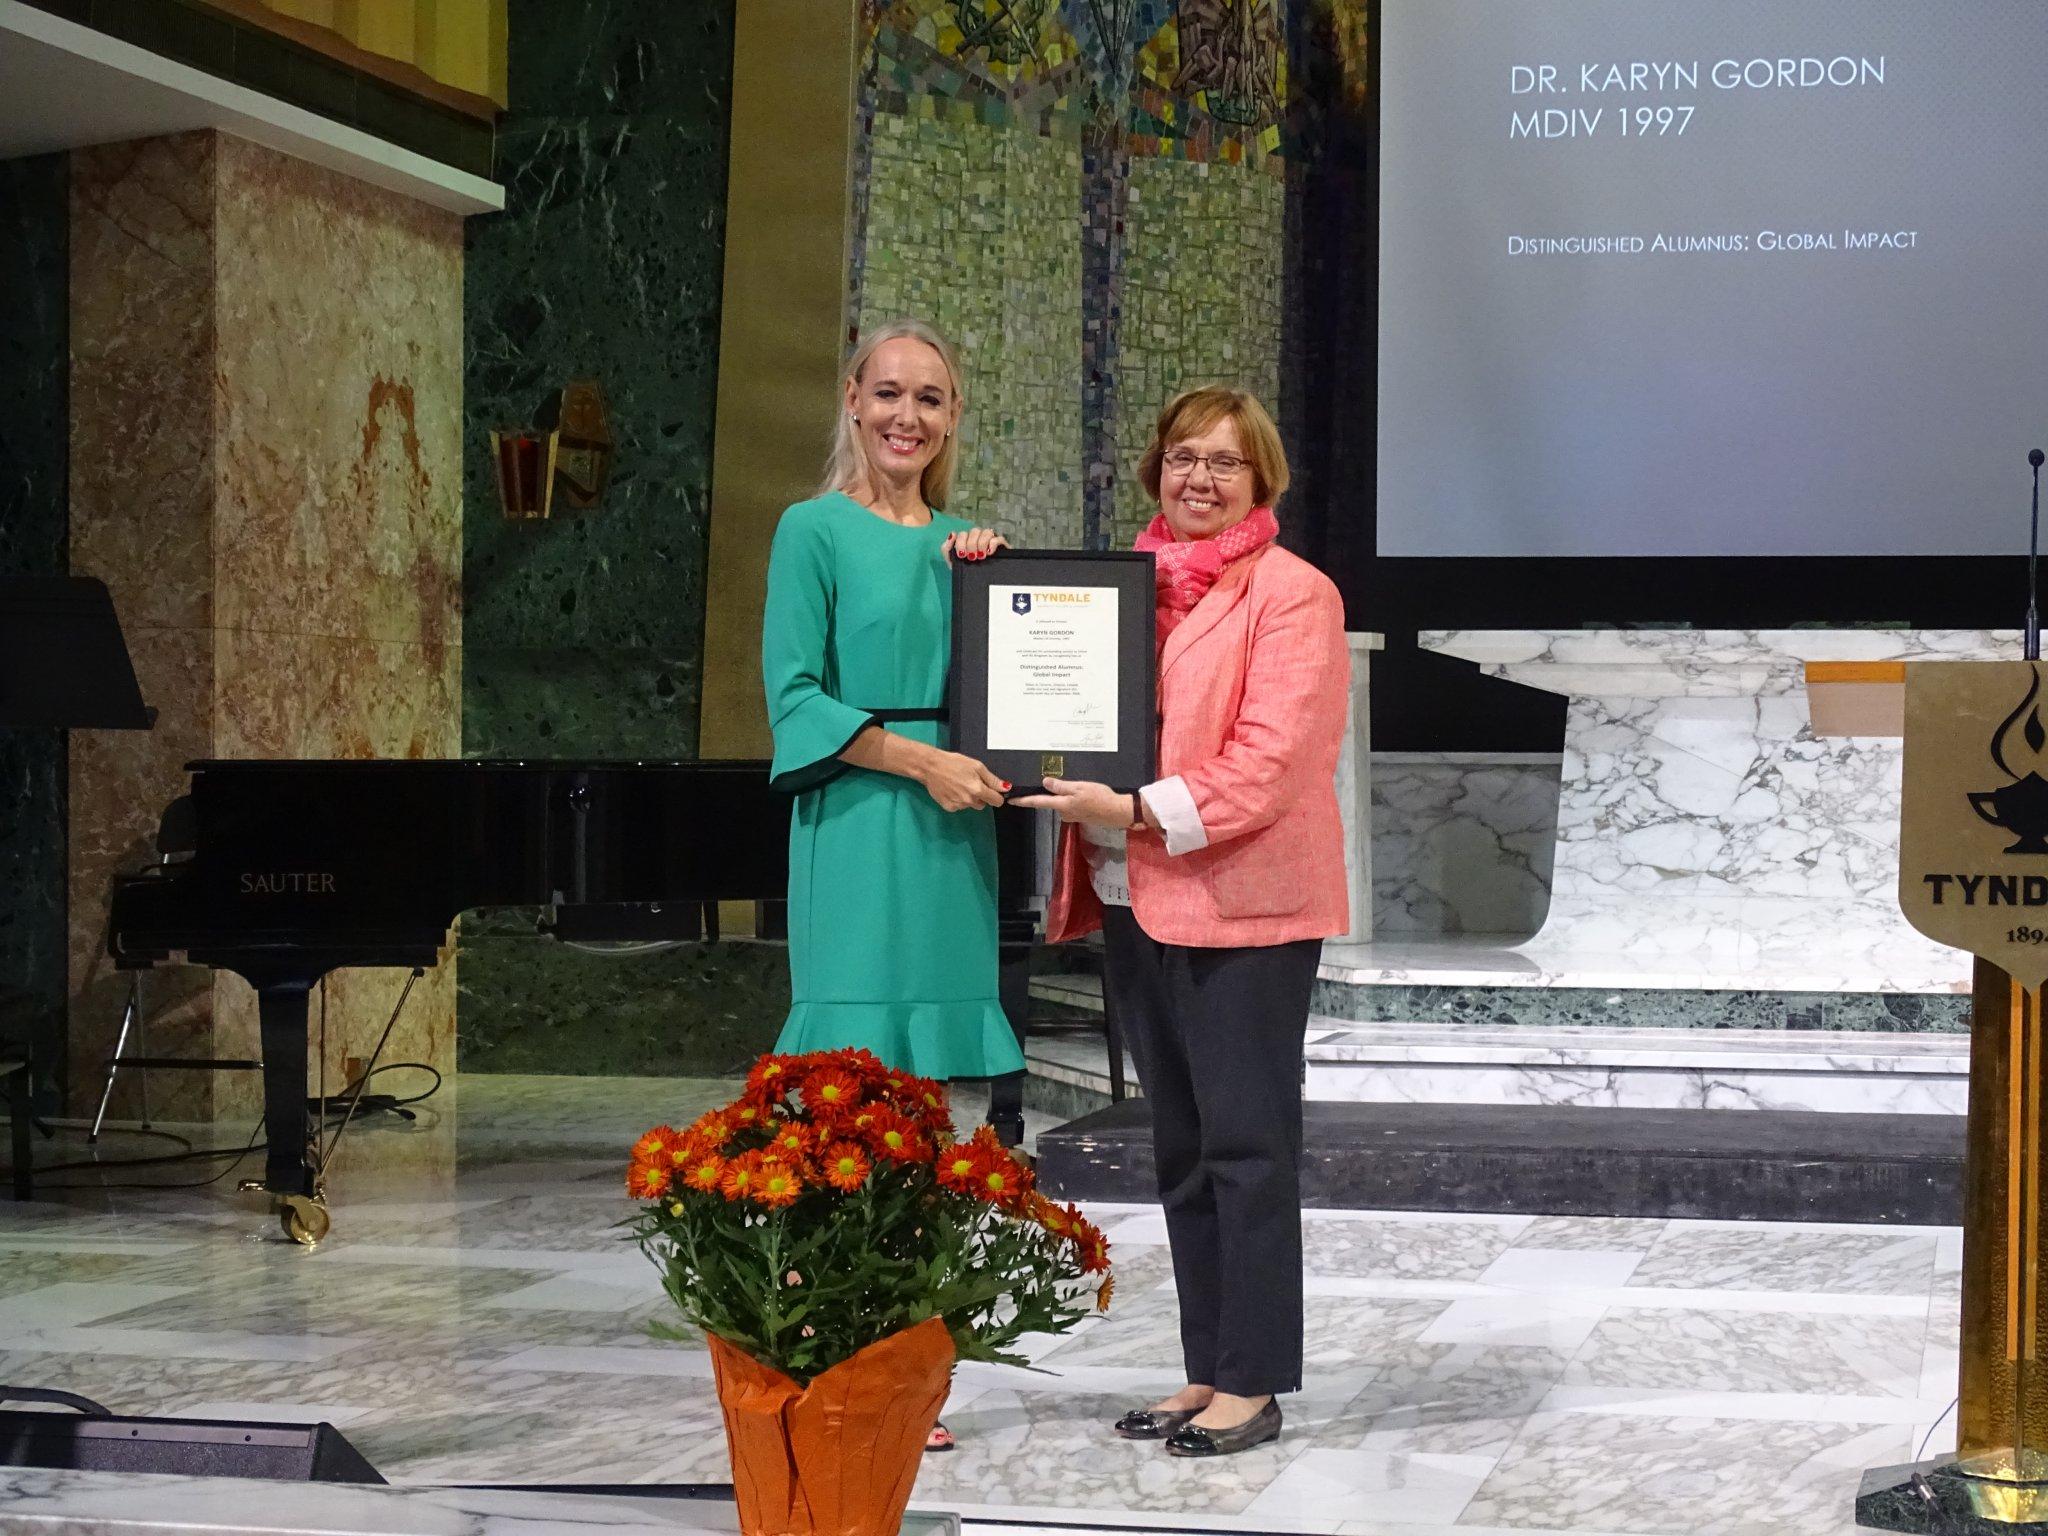 Distinguished Alumni: Dr. Karyn Gordon